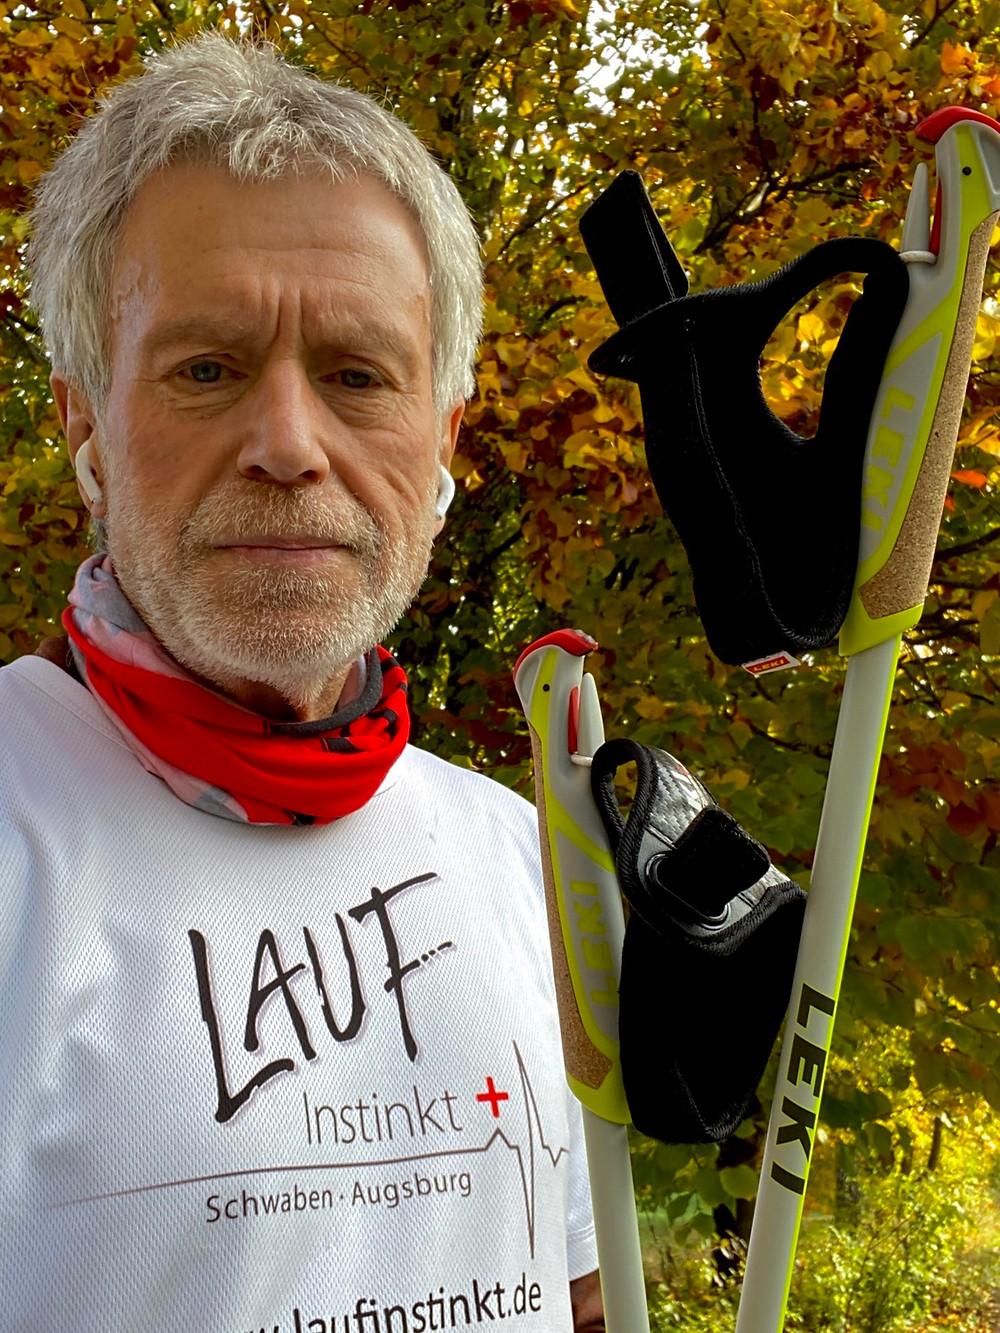 Lauftherapie, Lauftraining, Laufkurse | ©Laufinstinkt+®